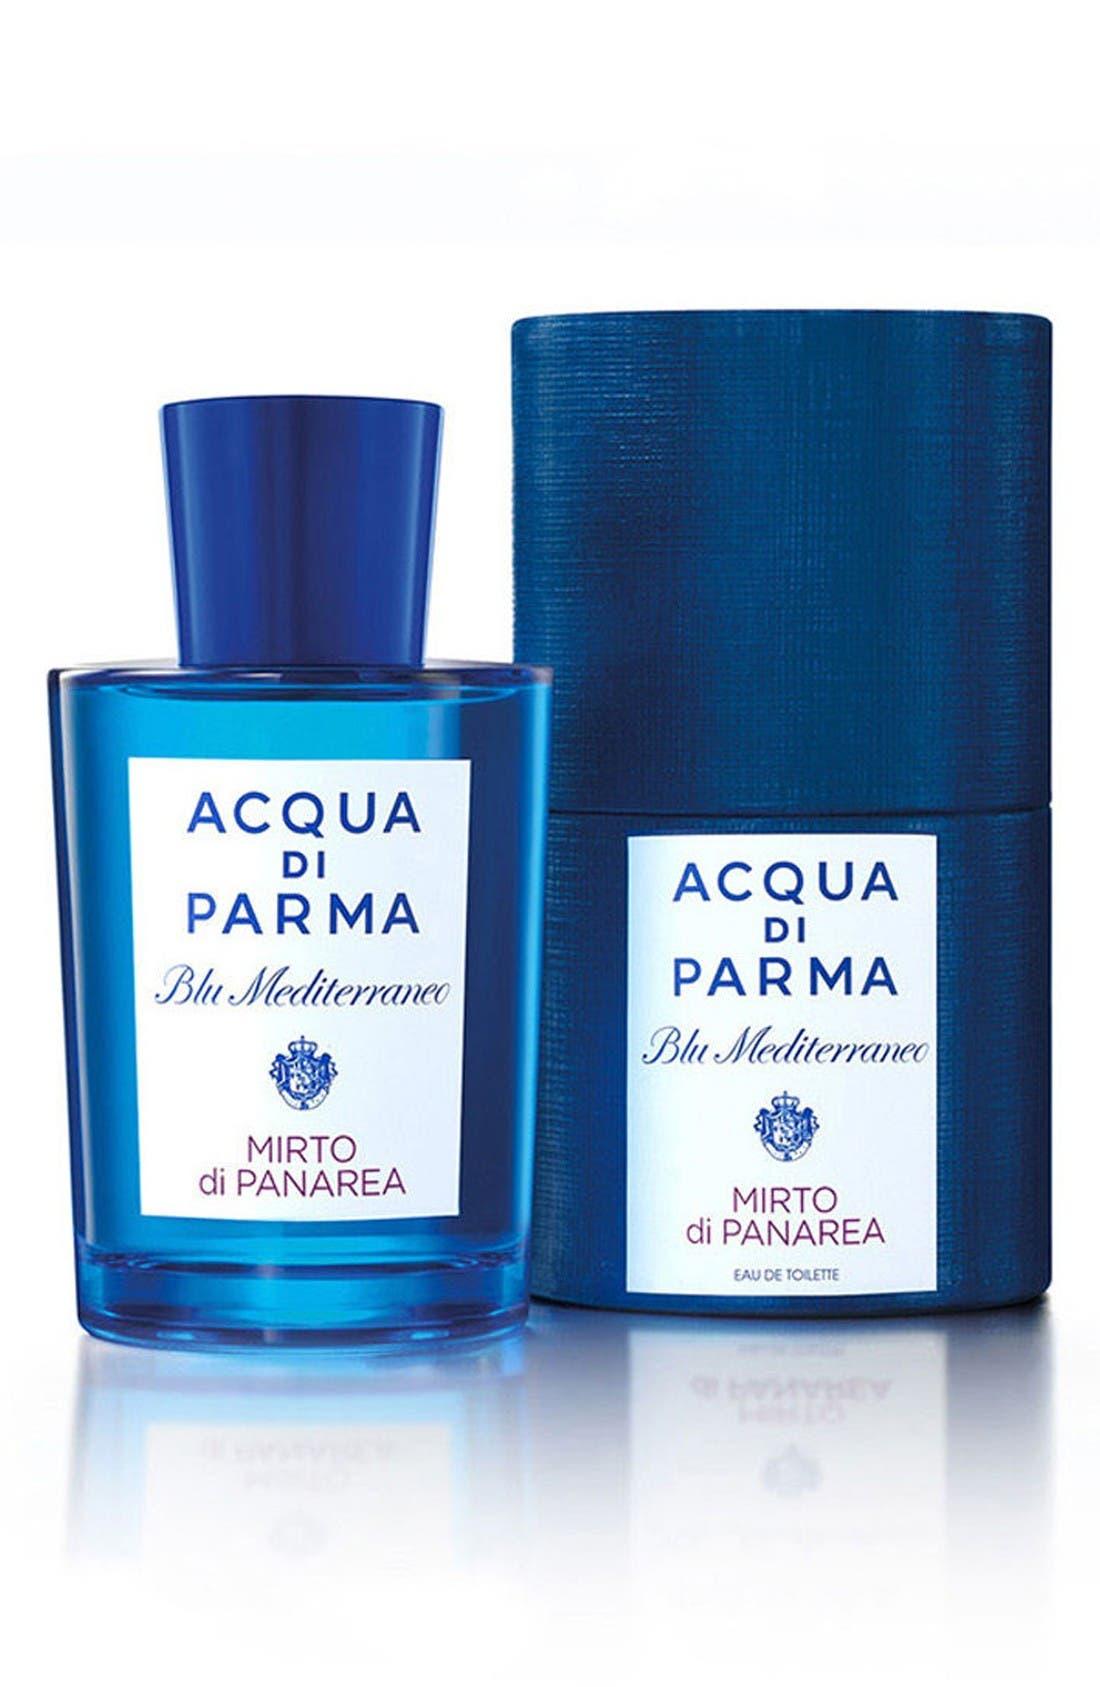 Alternate Image 2  - Acqua di Parma 'Blu Mediterraneo' Mirto di Panarea Eau de Toilette Spray